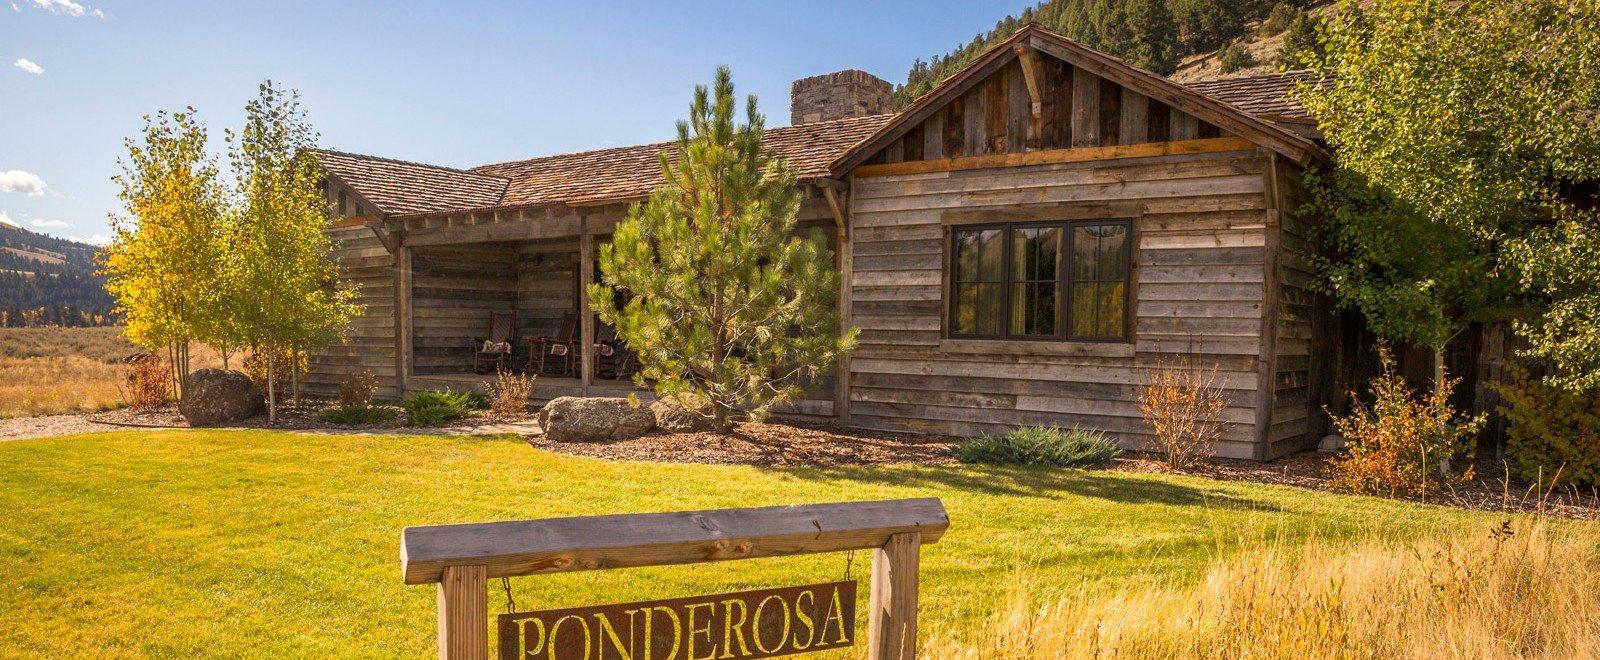 Ponderosa House Plans